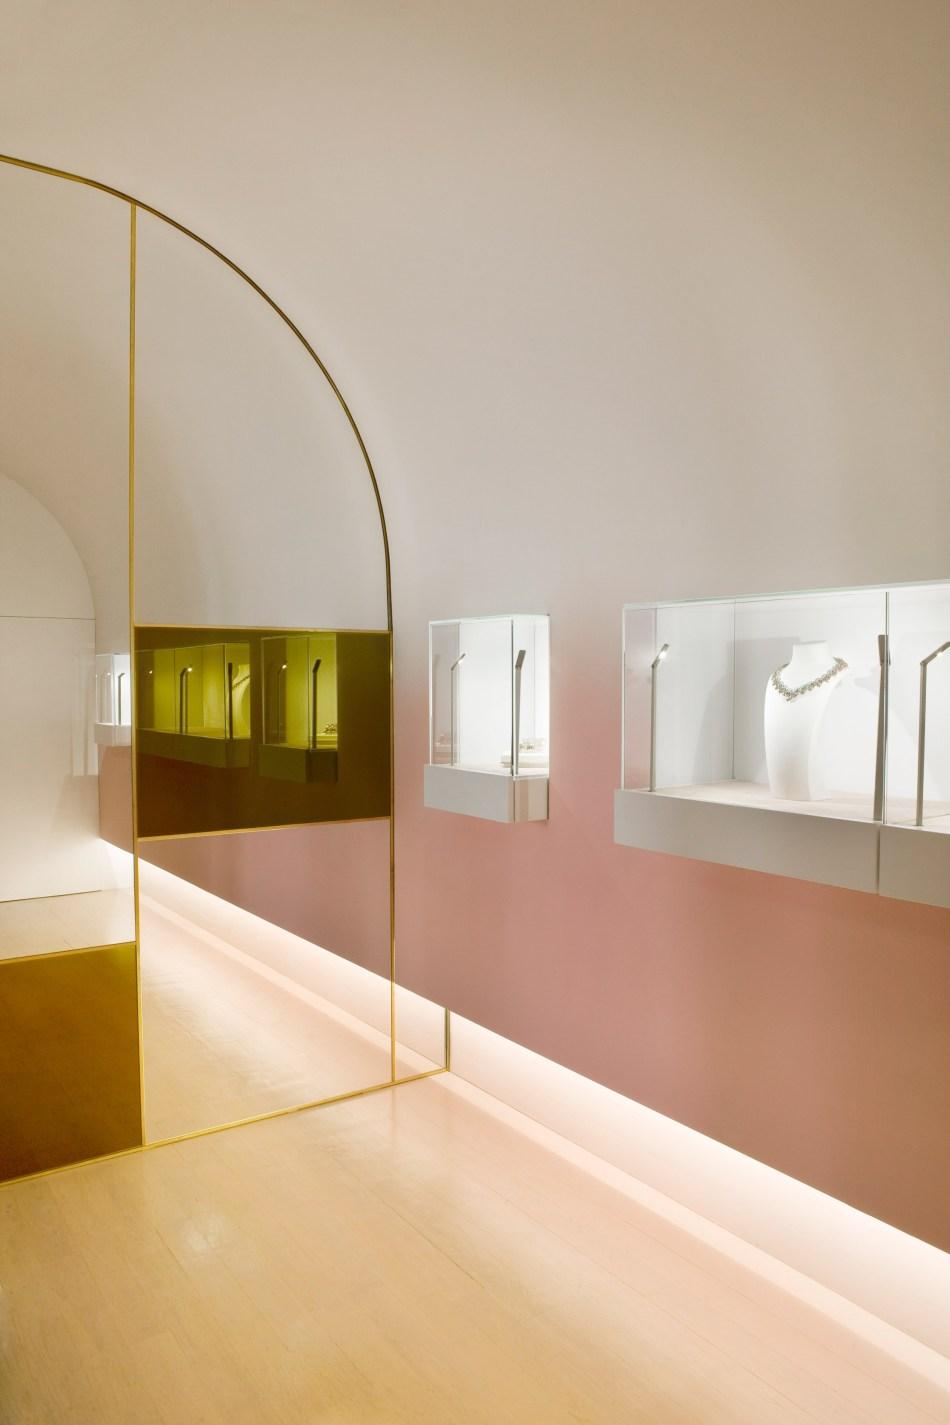 nuun-jewellery-shop-java-architectes-interiors-retail-paris-france_dezeen_2364_col_6